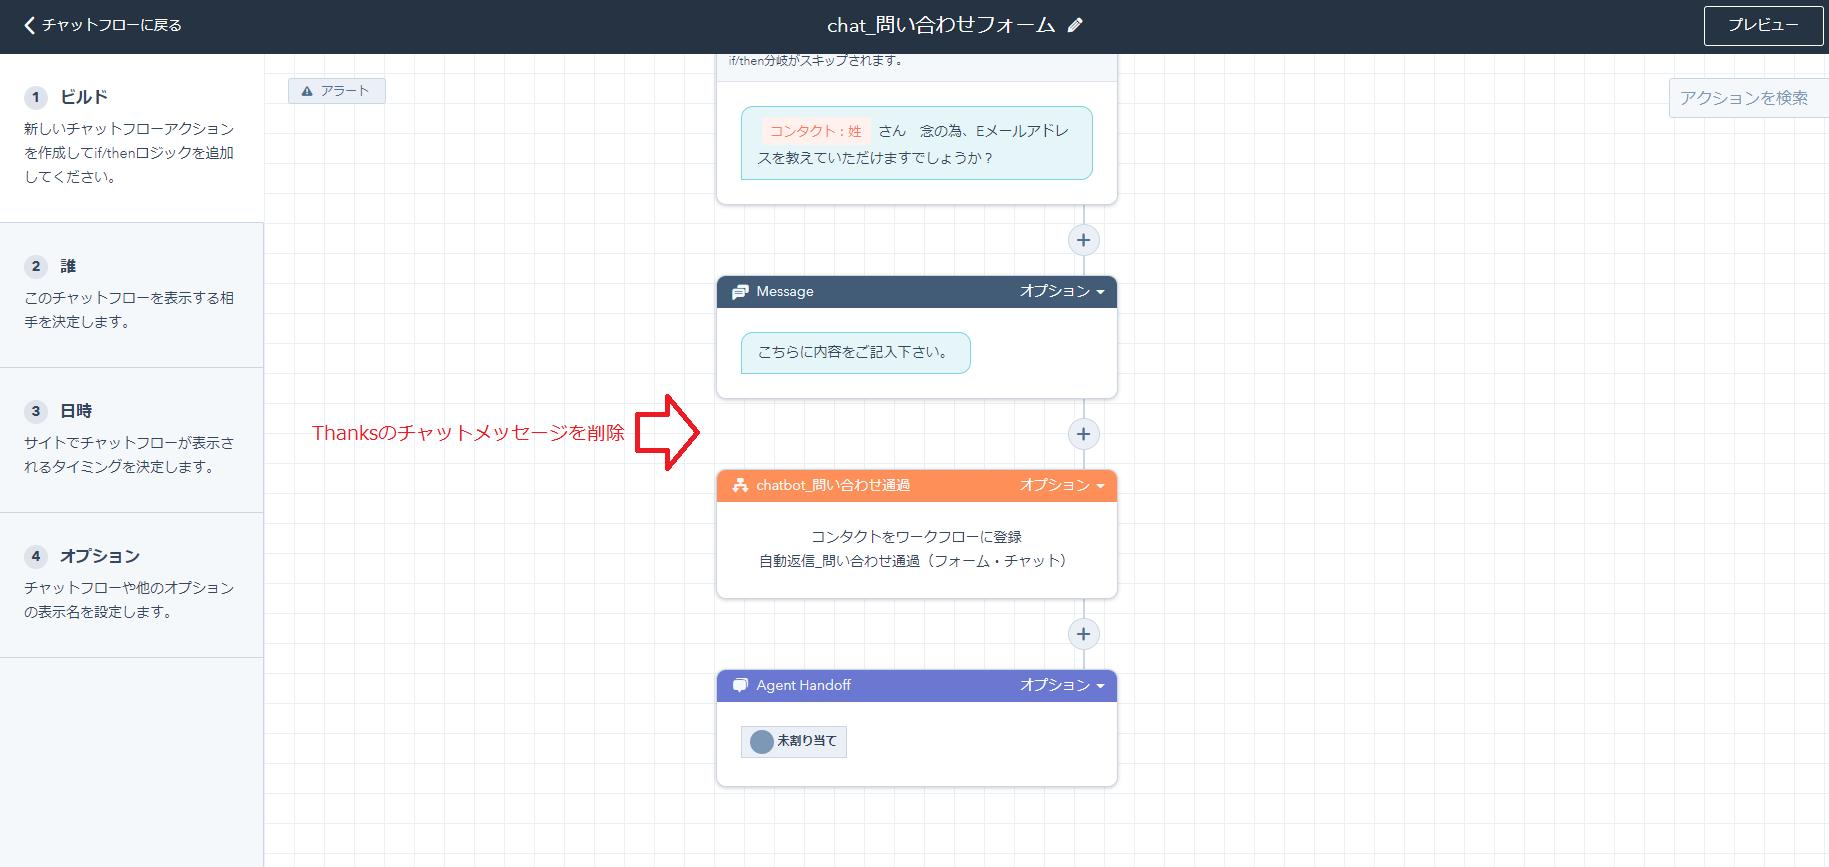 marketing-chat-bot-hubspot-customer-support_setting_01